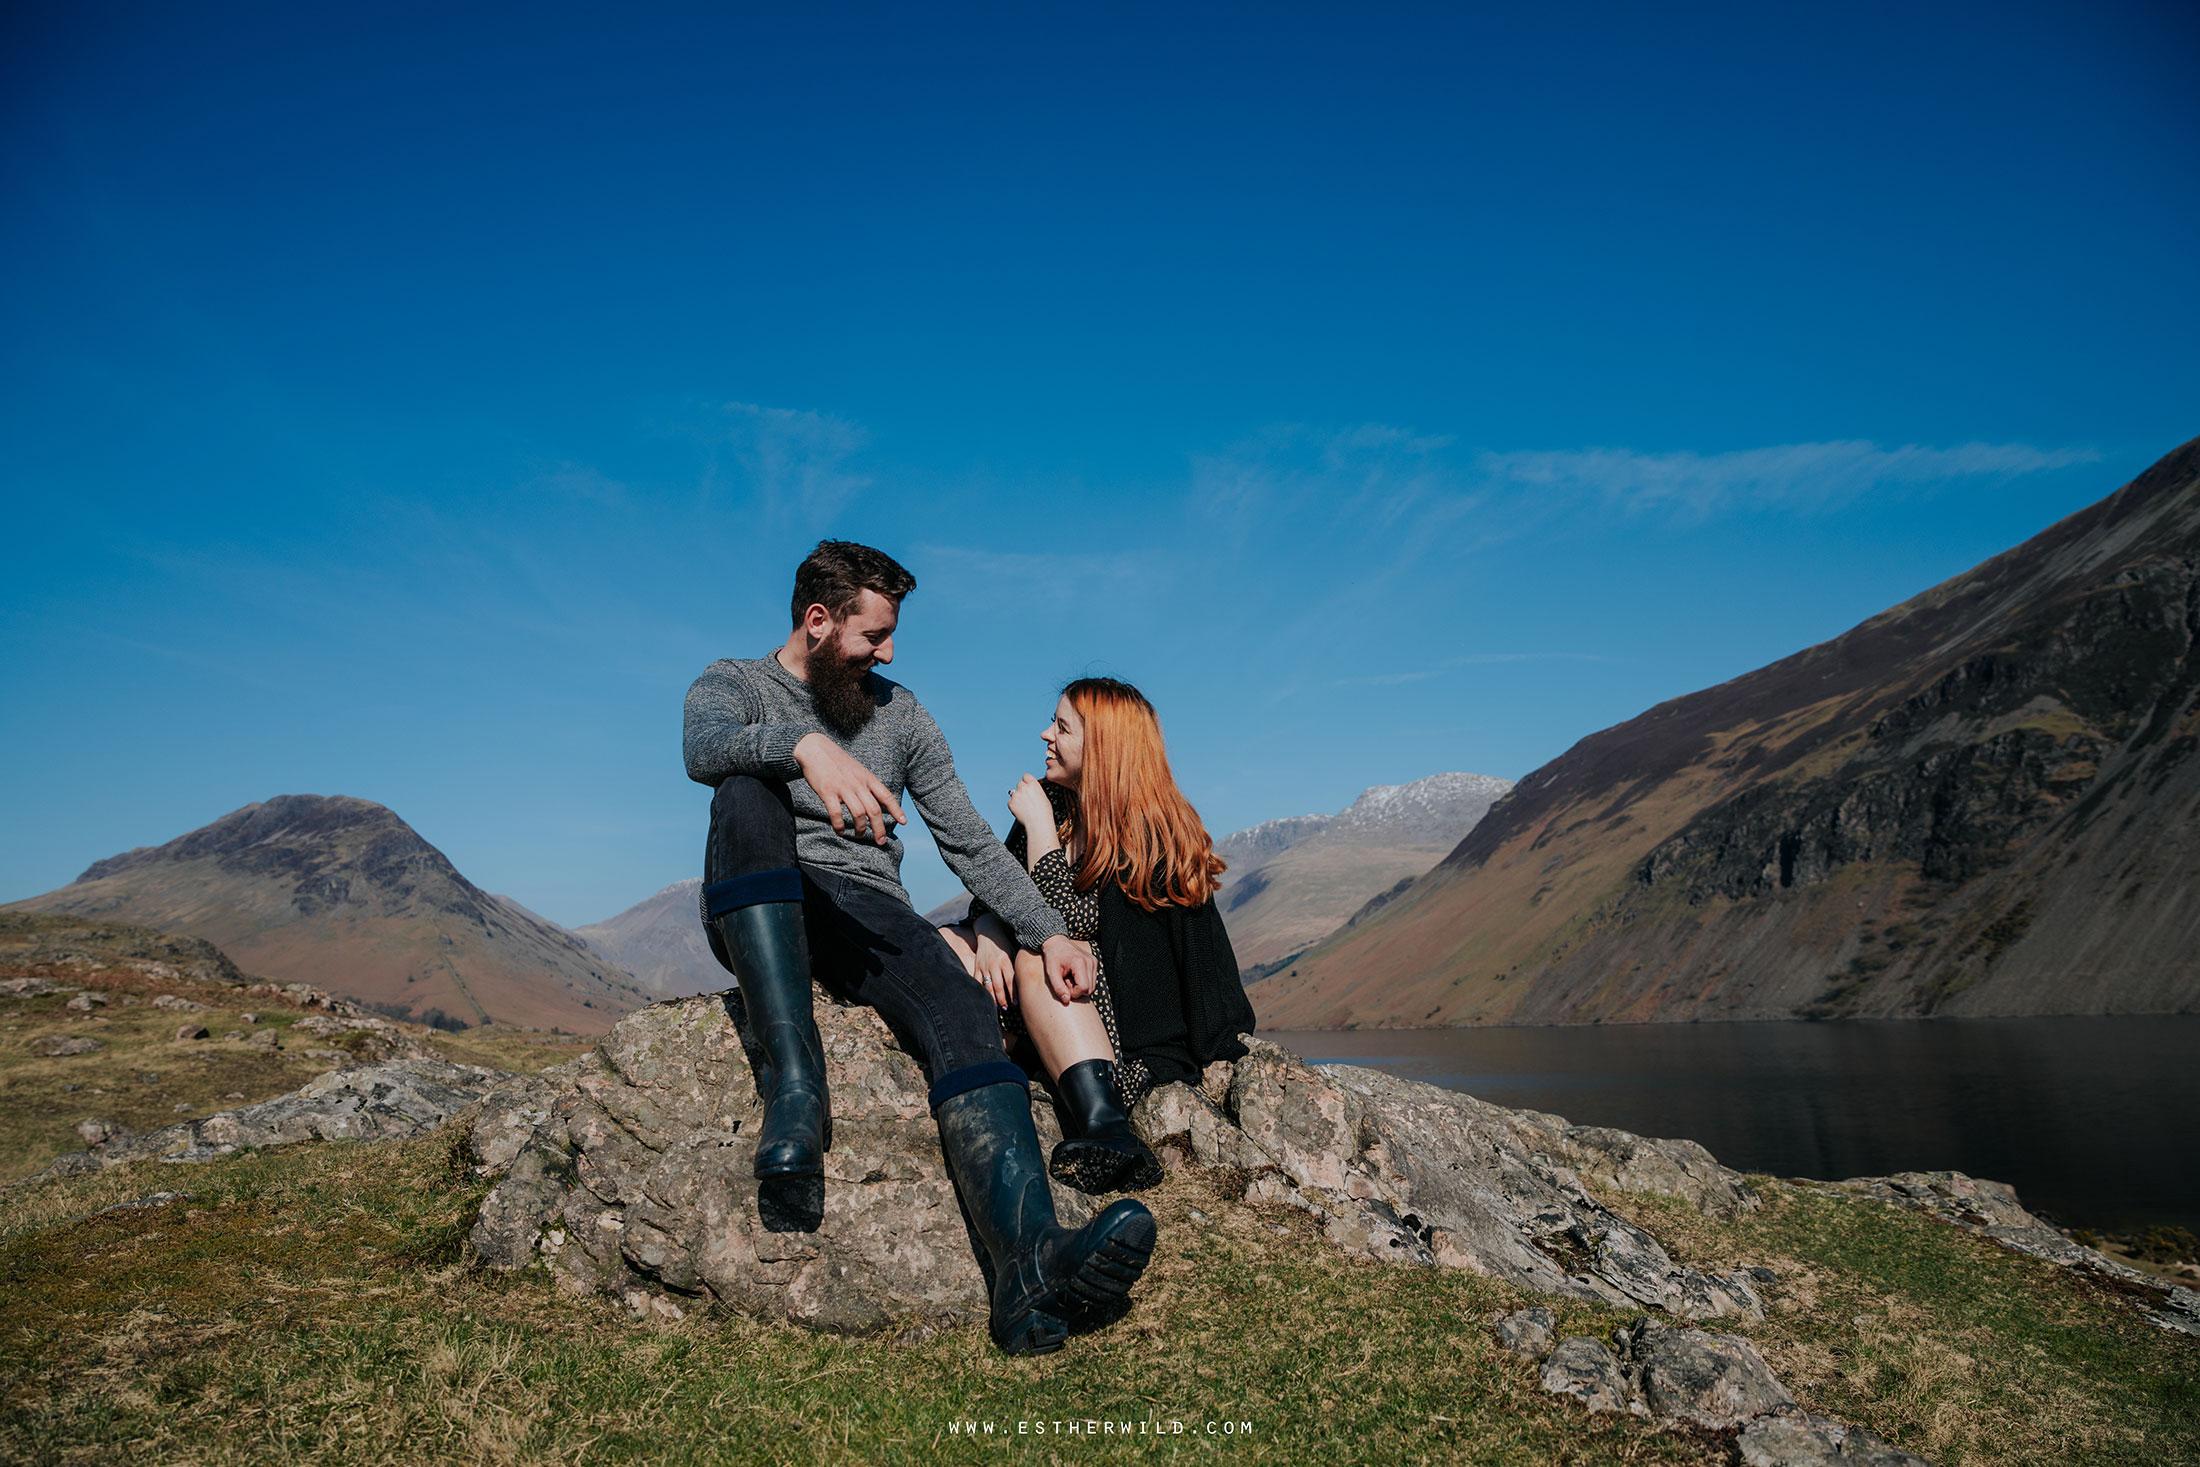 Cumbria_Lake_District_Wasdale_Wedding_Photographer_Destination_Engagement_Anniversary_Esther_Wild_IMG_3386.jpg